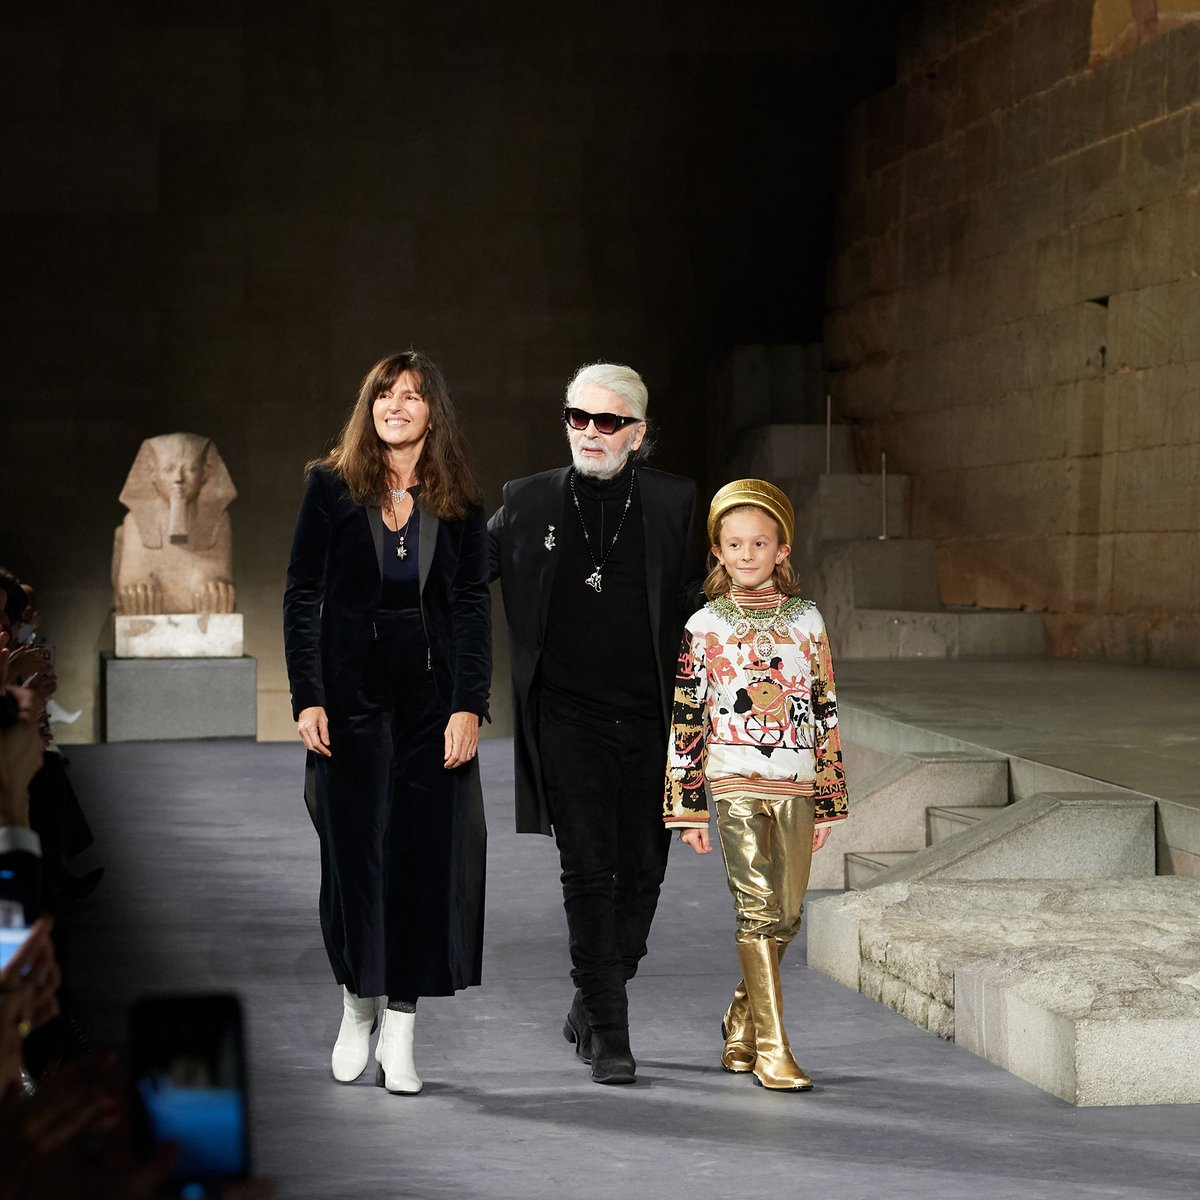 ae1d1e4cfc Virginie Viard  Αυτή είναι η διάδοχος του Karl Lagerfeld